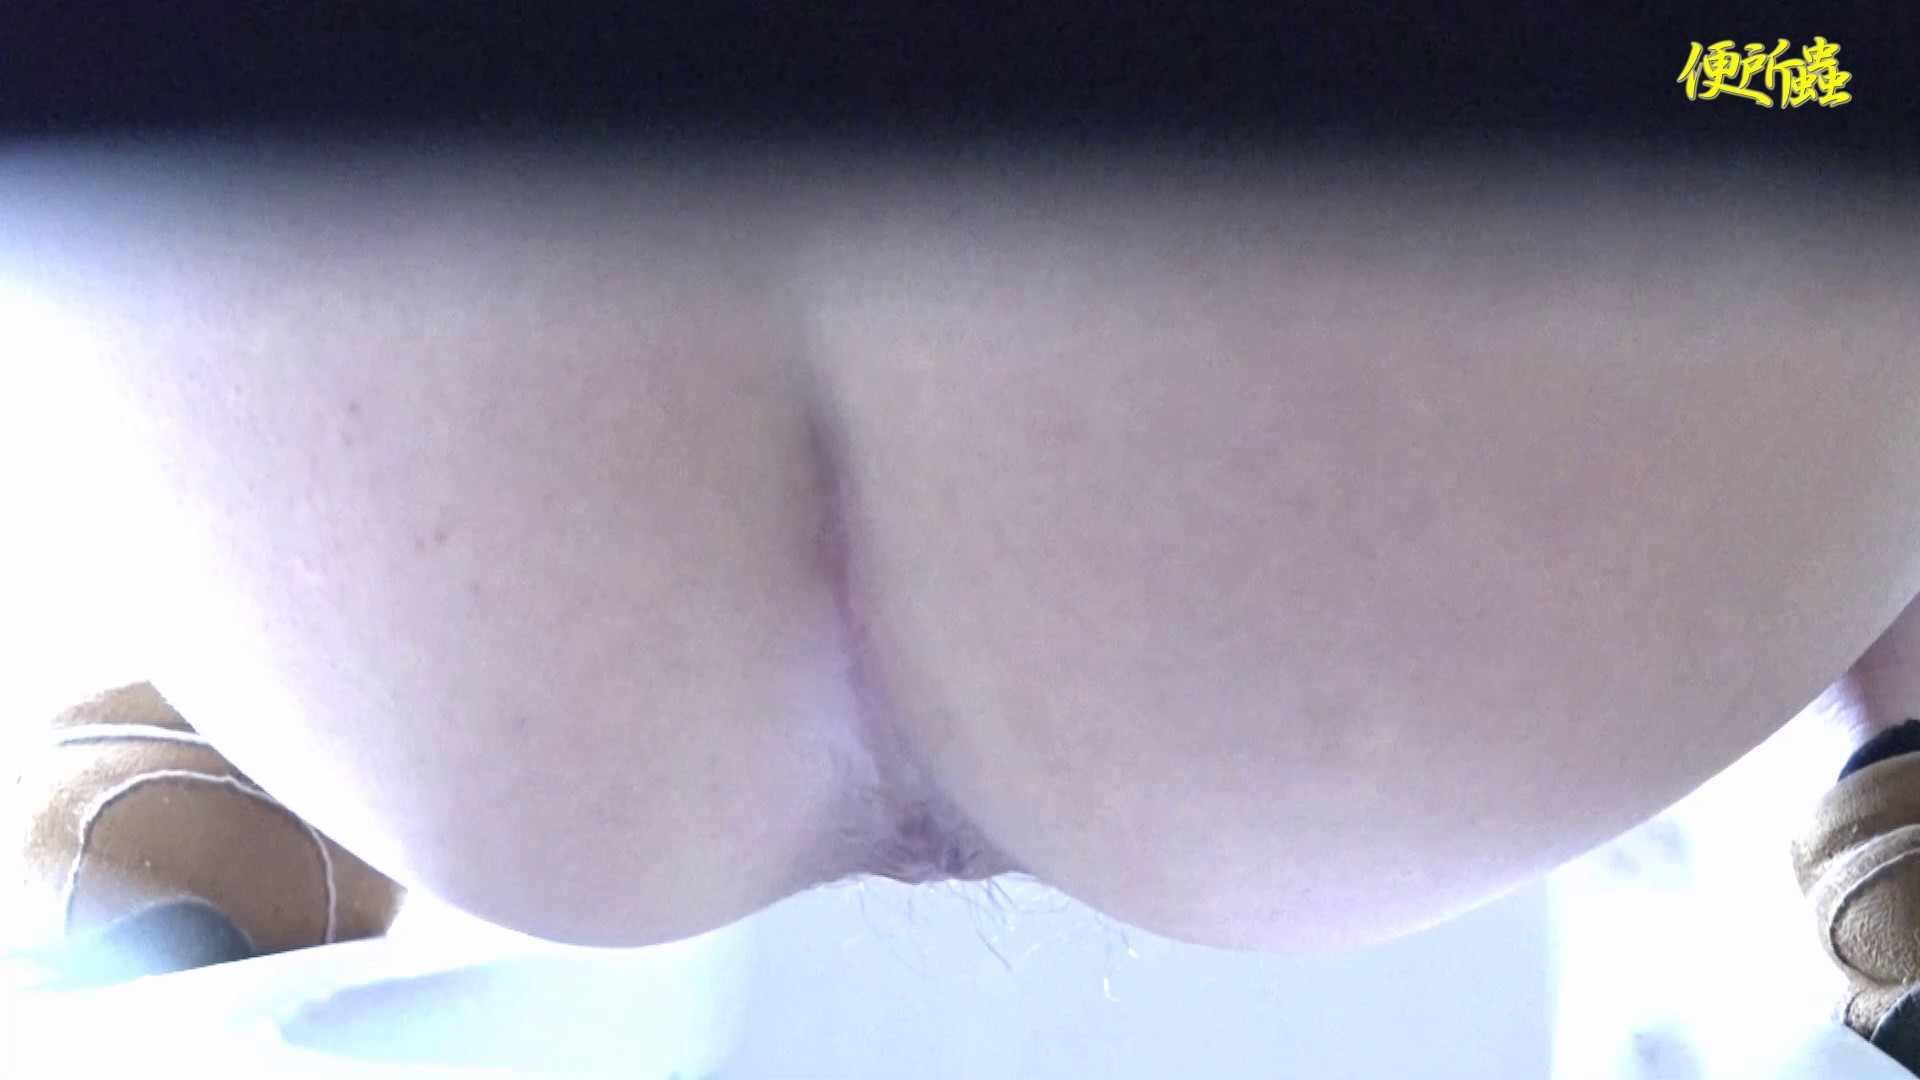 vol.01 便所蟲さんのリターン~便所蟲2匹目~ 高画質 われめAV動画紹介 97枚 56